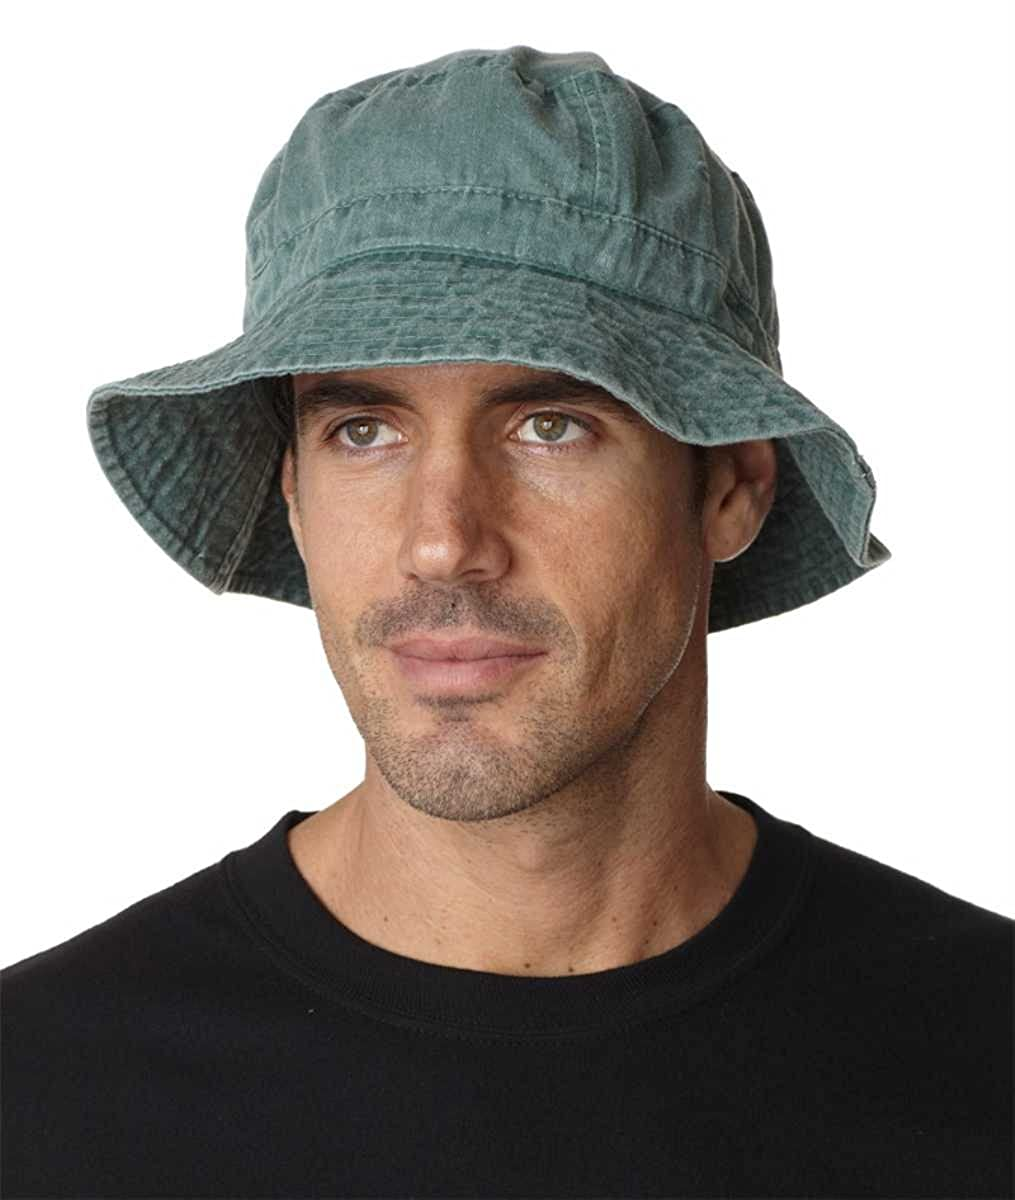 Khaki XL Adams Vacationer Pigment Dyed Twill Bucket Cap